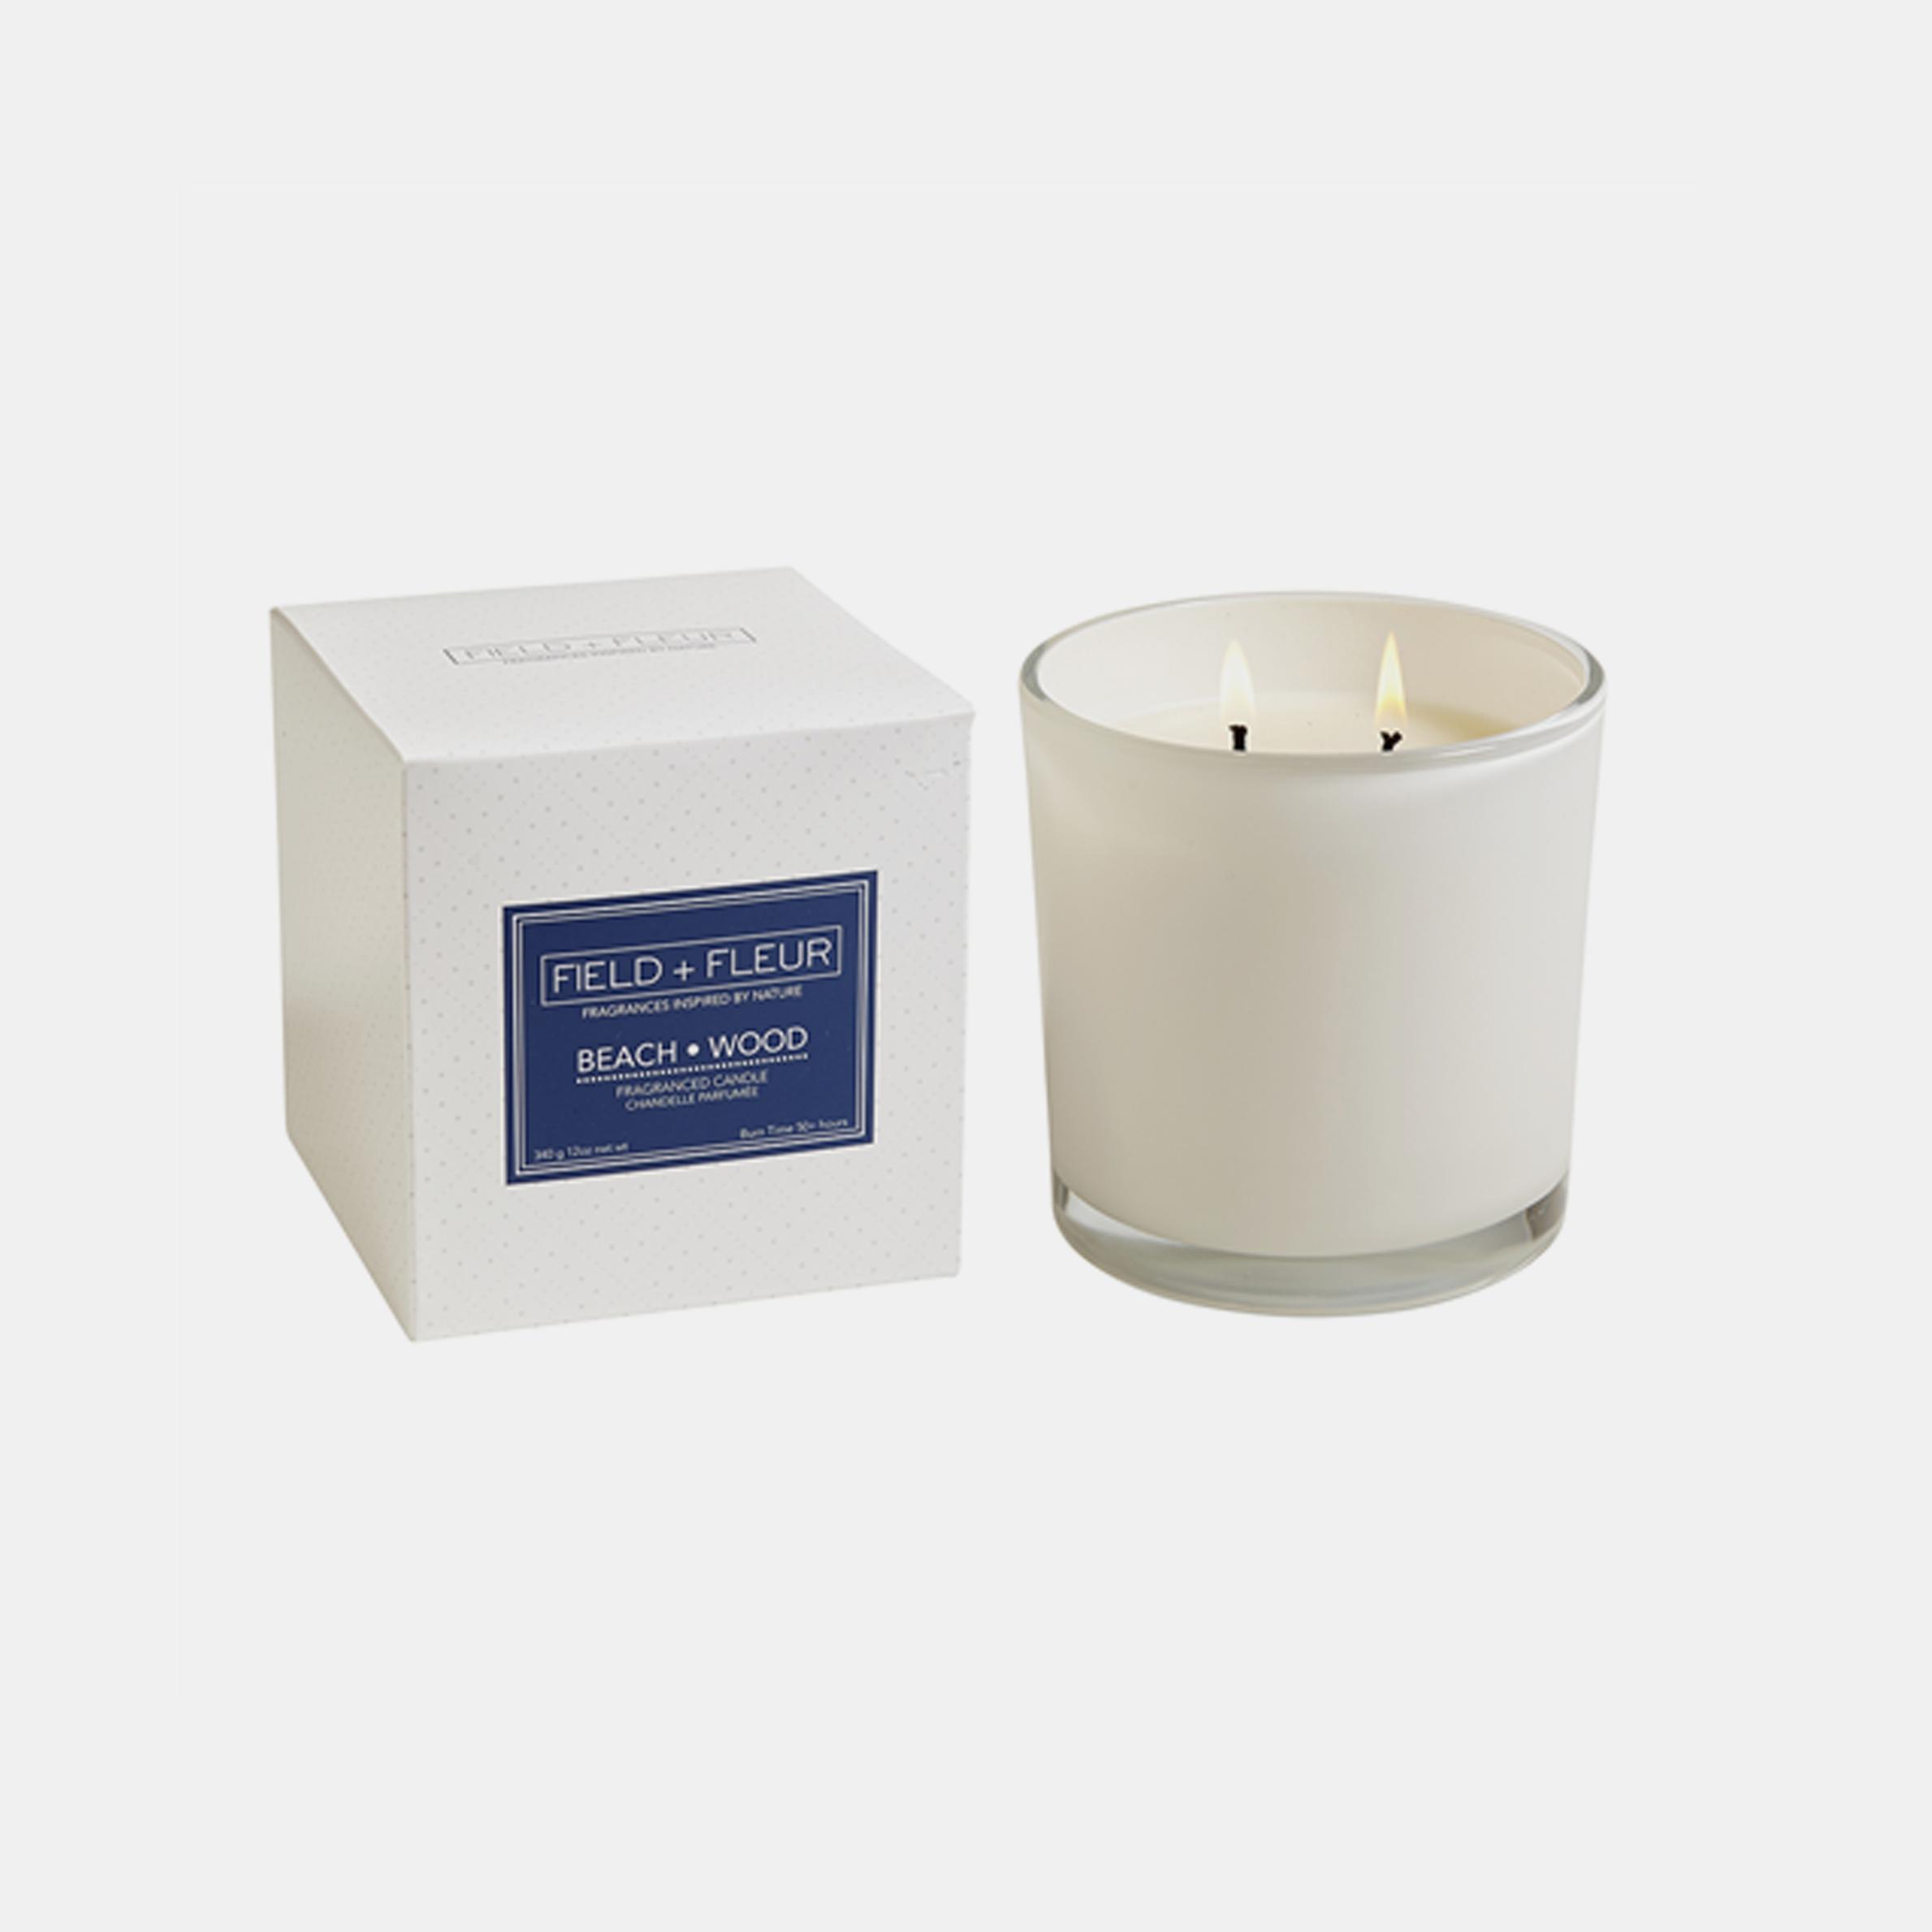 Beach Wood Candle  Two-wick candle in white glass jar. 12 oz. SKU38384HLN